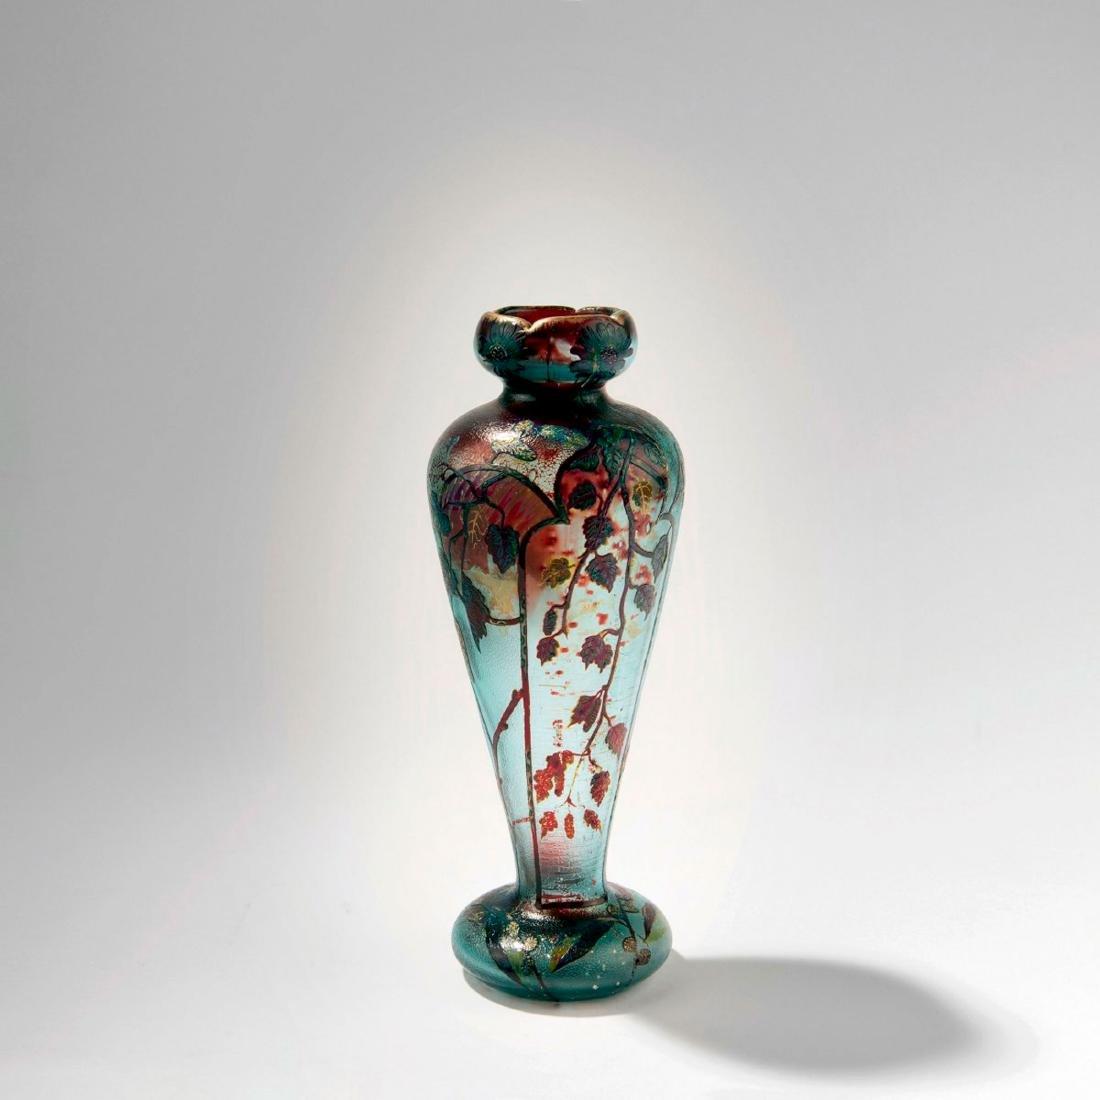 'Branches de Noisettier' vase, 1895